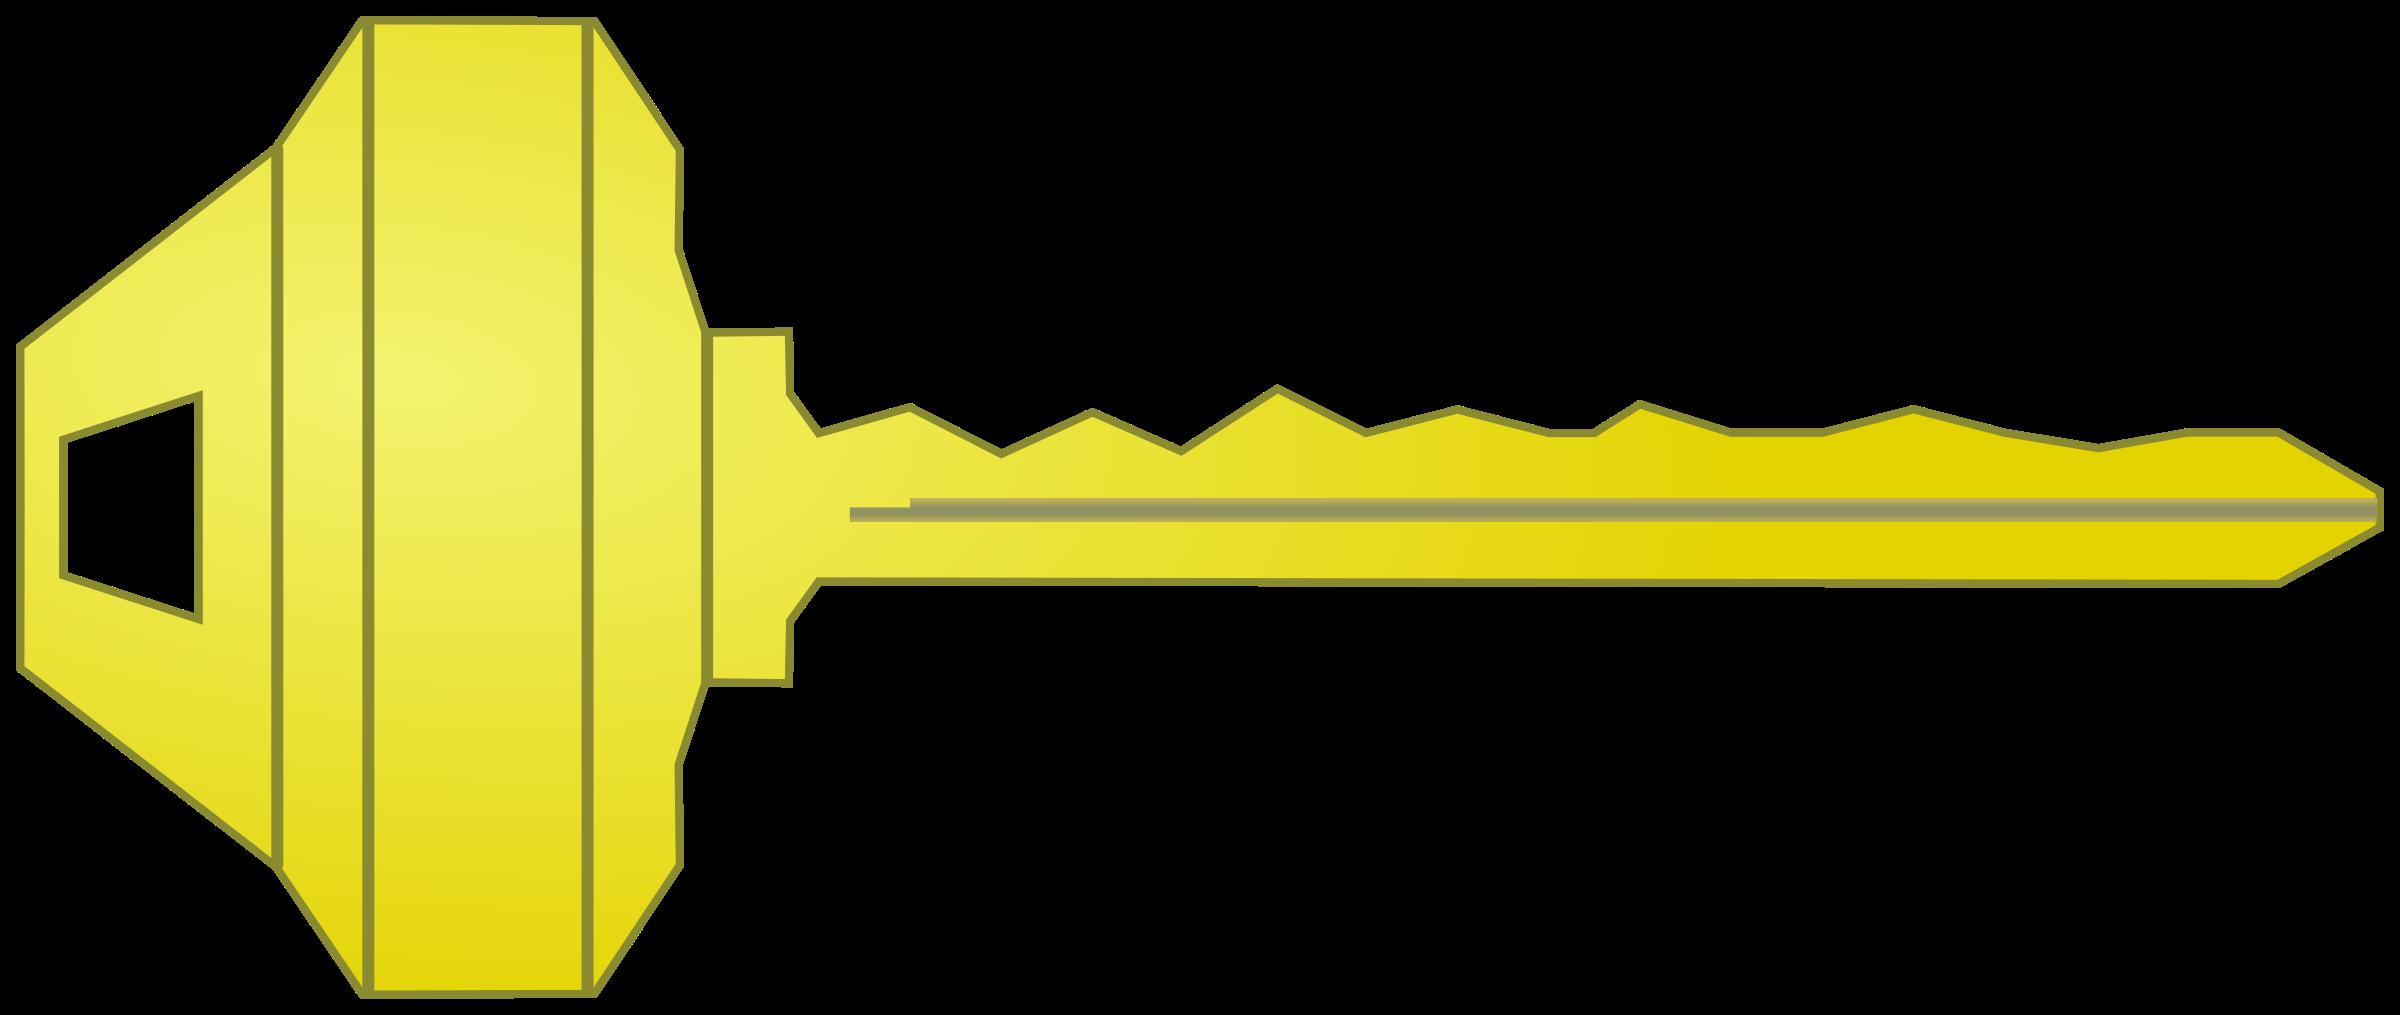 House Key Vector Clipart image - Free stock photo - Public ...